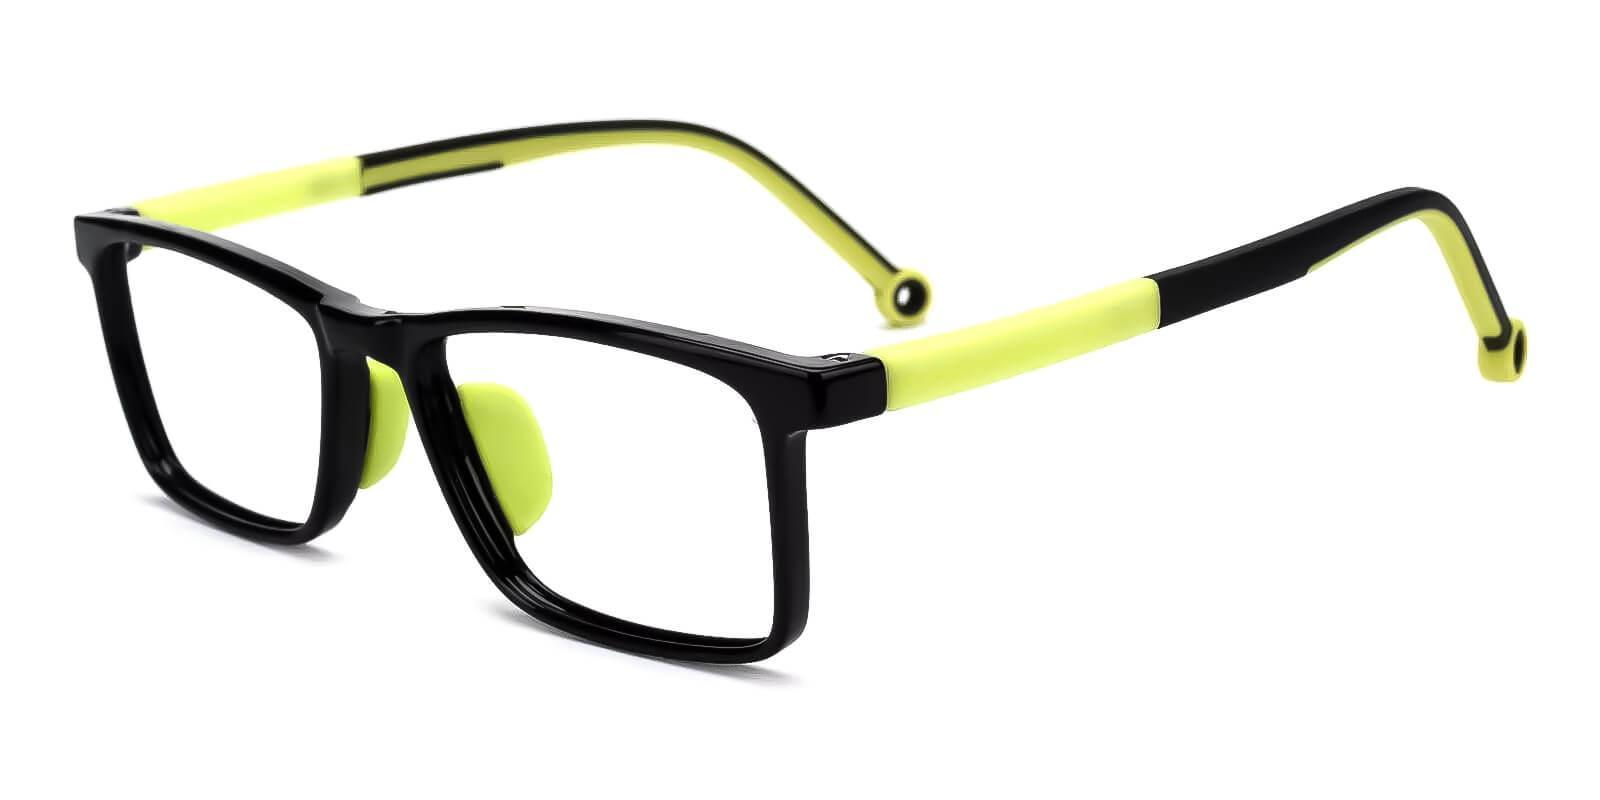 Kids-Rapture Yellow TR Eyeglasses , Fashion , UniversalBridgeFit Frames from ABBE Glasses